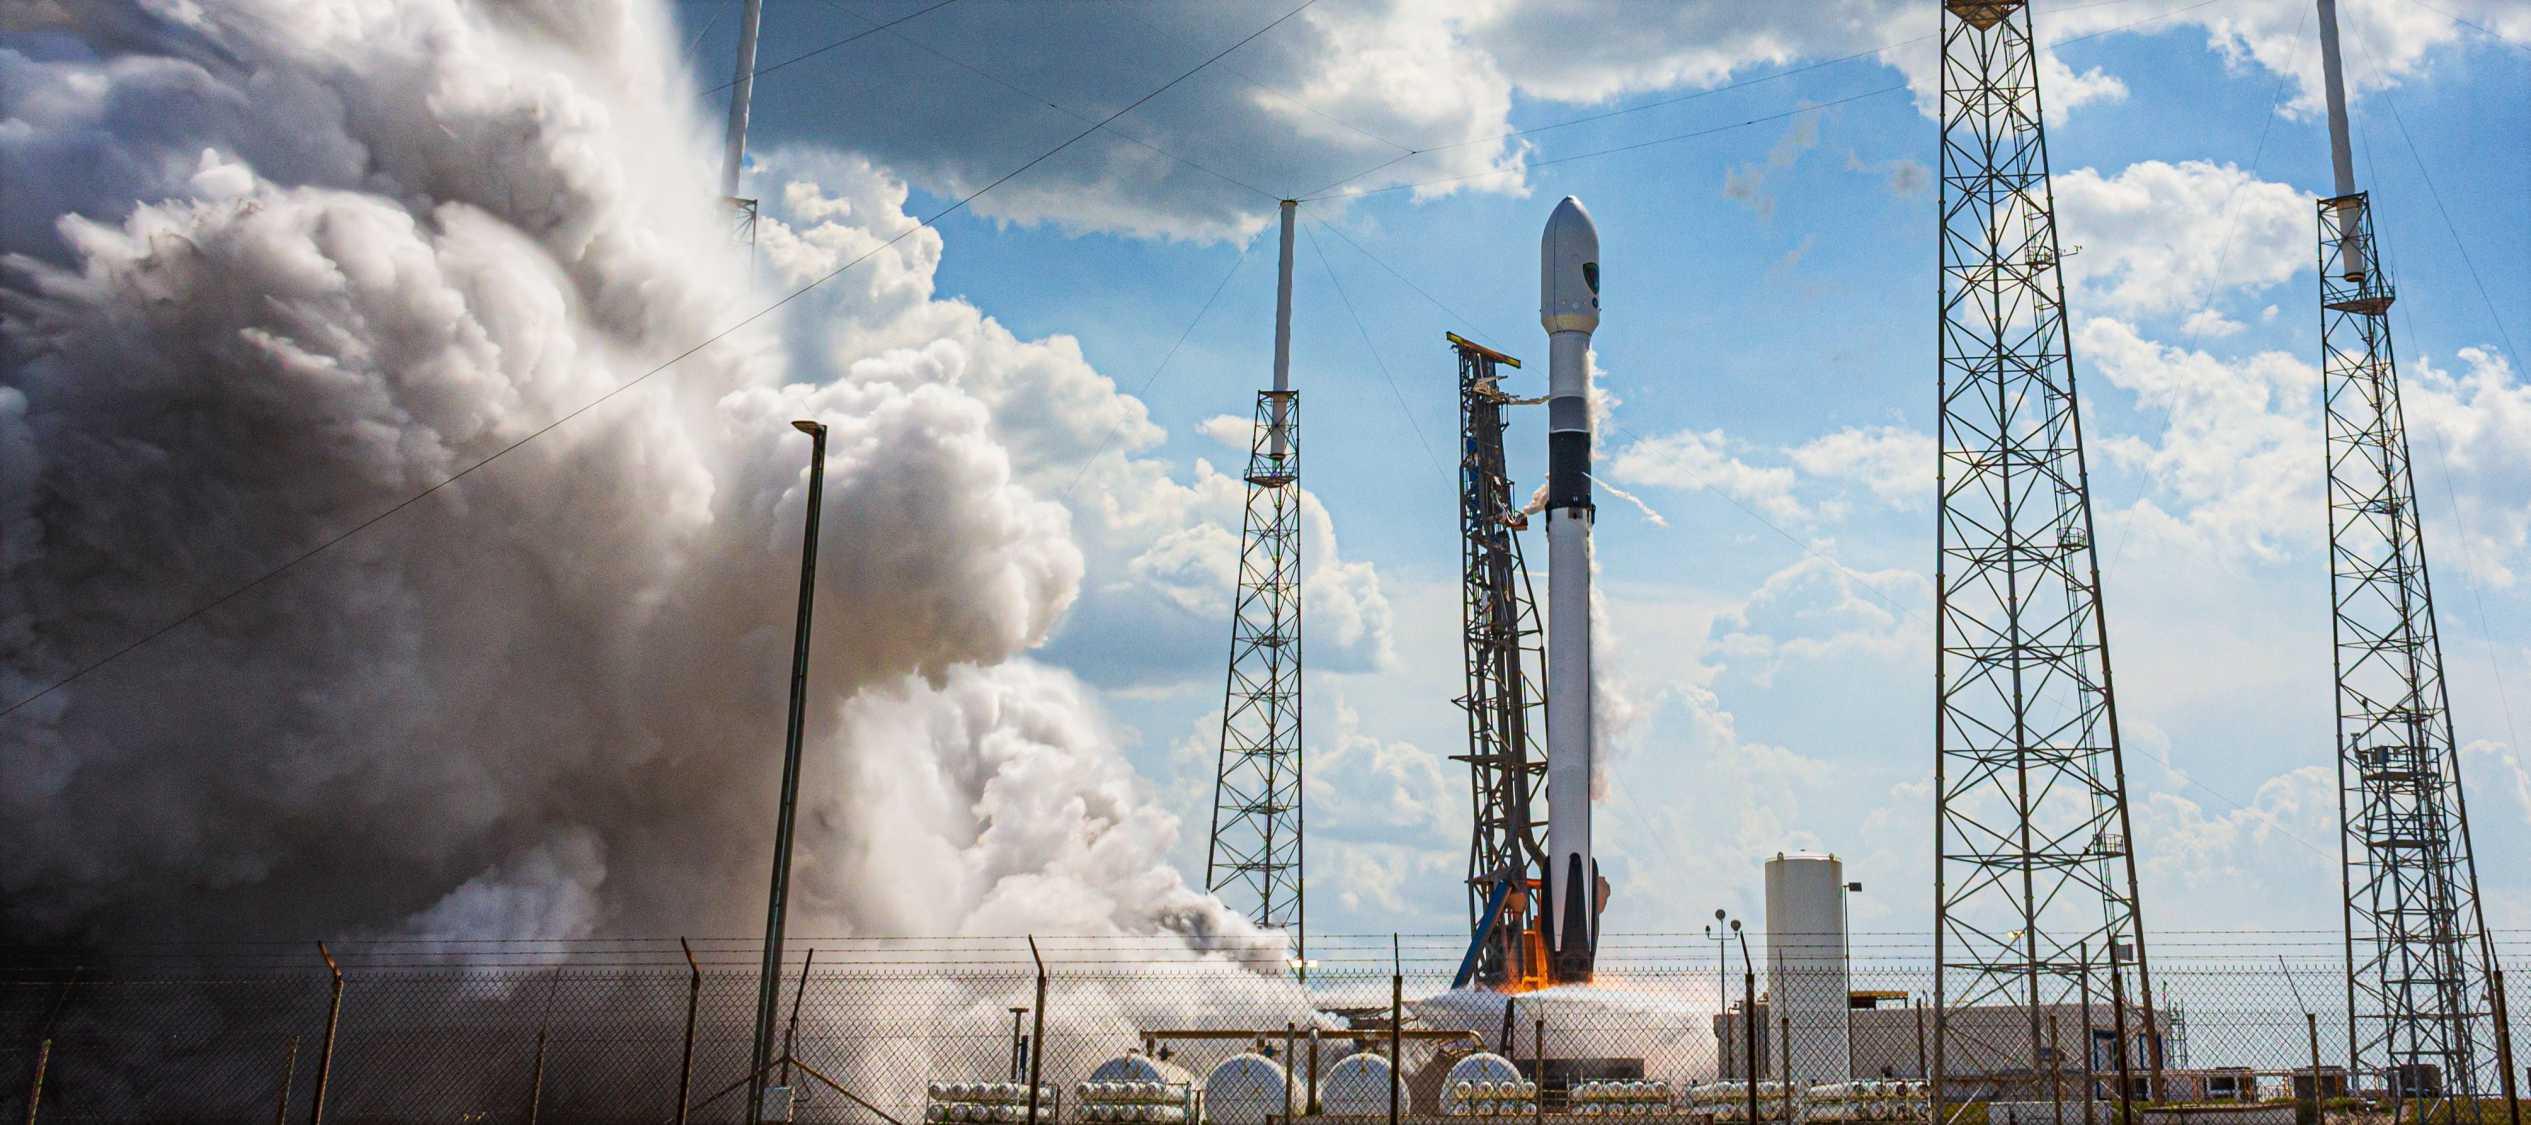 GPS III SV03 Falcon 9 B1060 063020 (Richard Angle) launch 5 crop 2 (c)